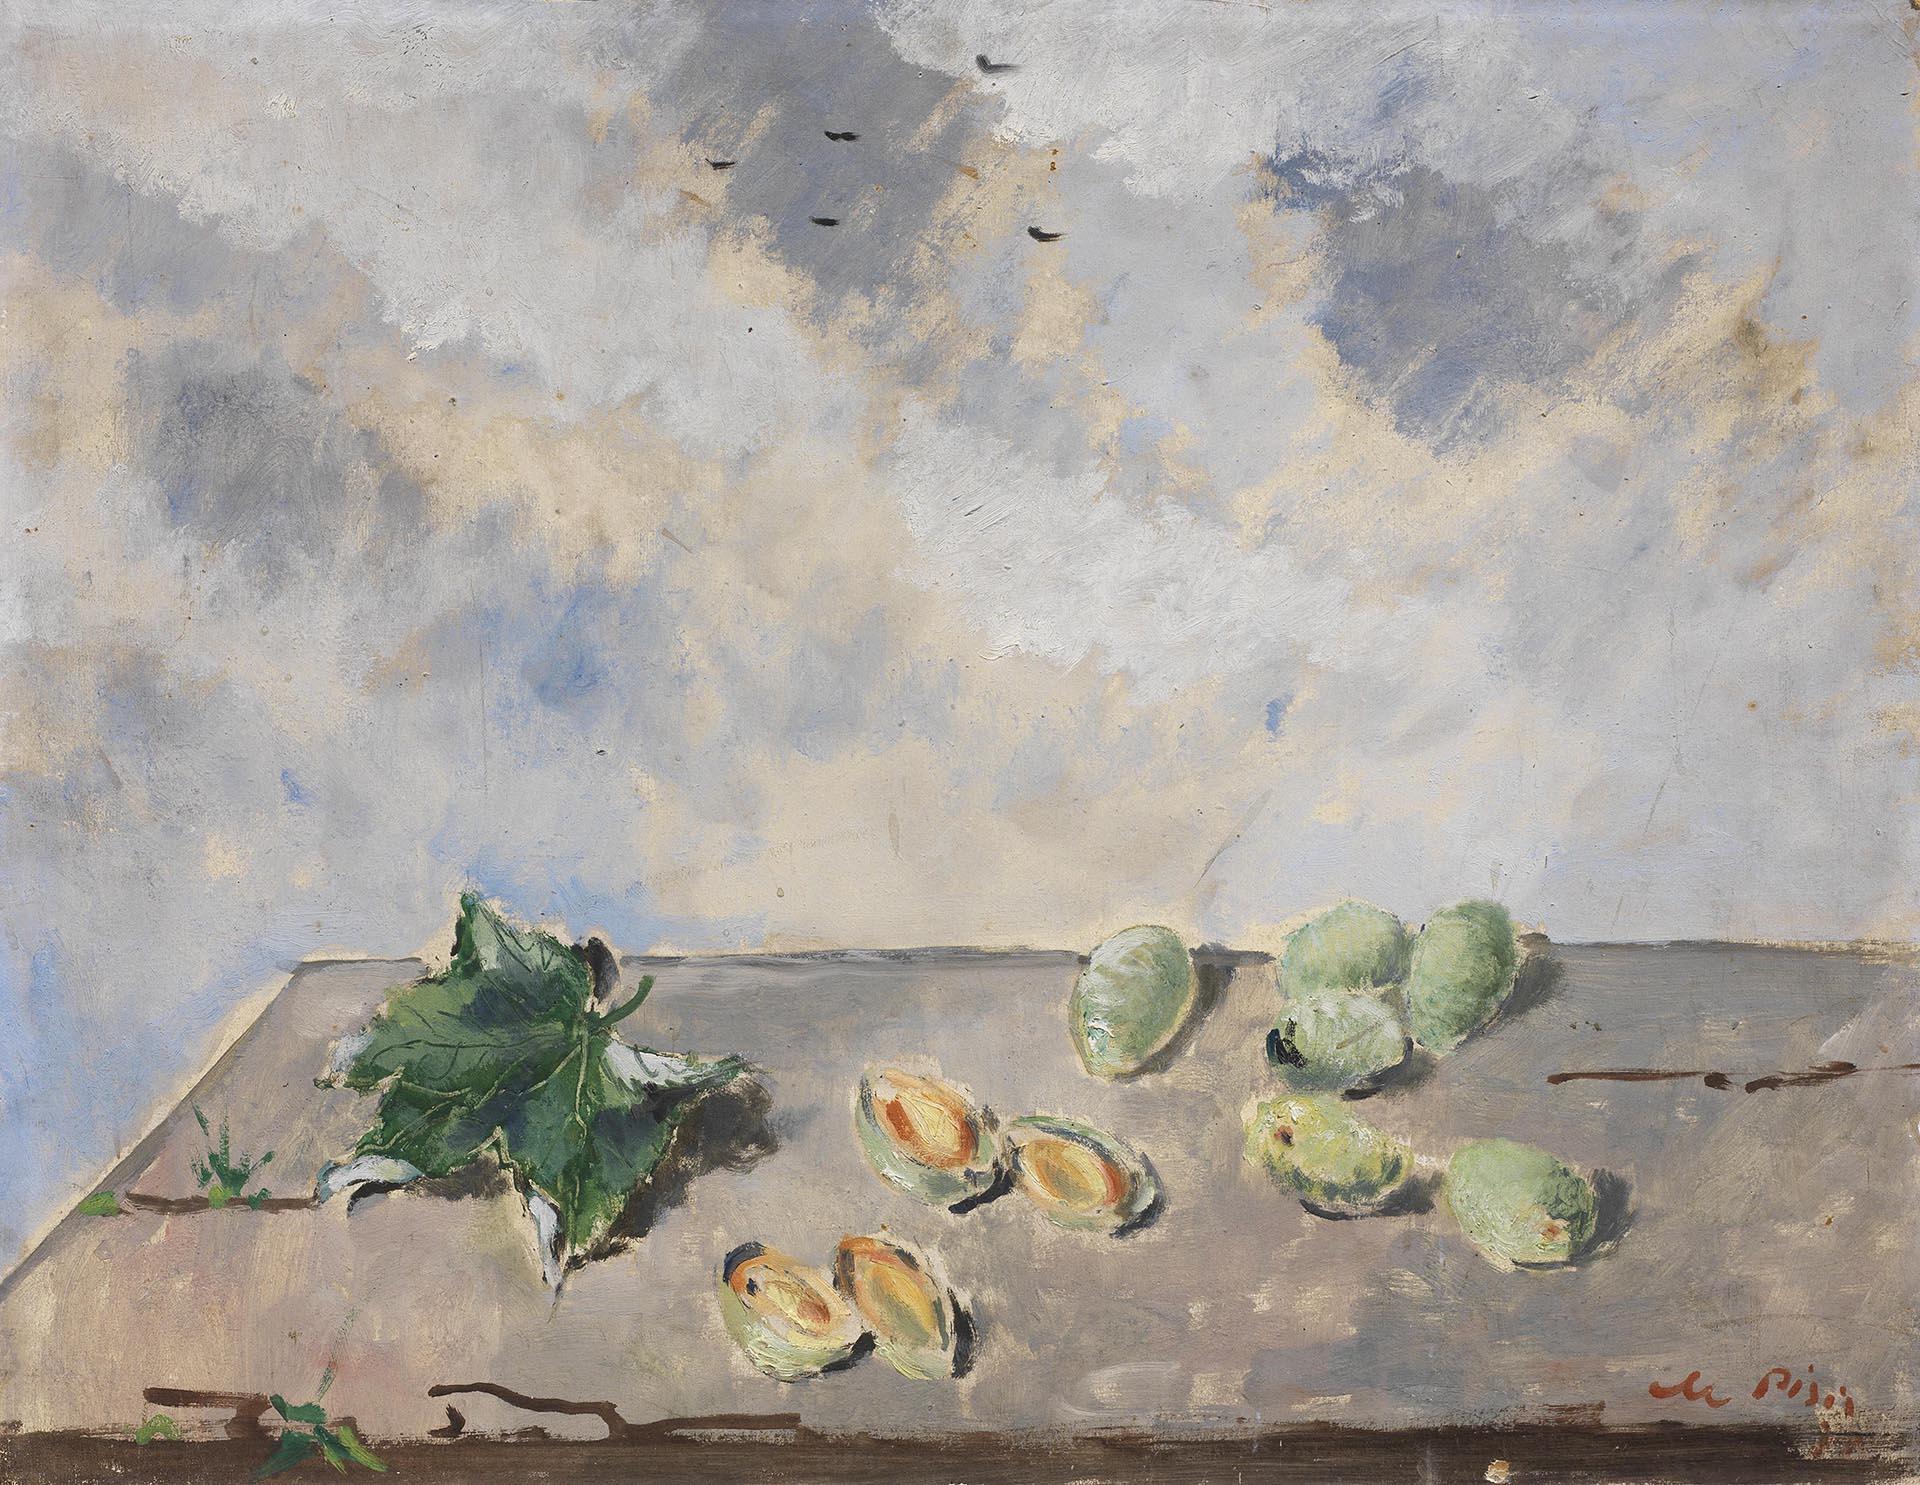 De Pisis, Natura morta con mandorle, 1933, 50.5x65.5 cm